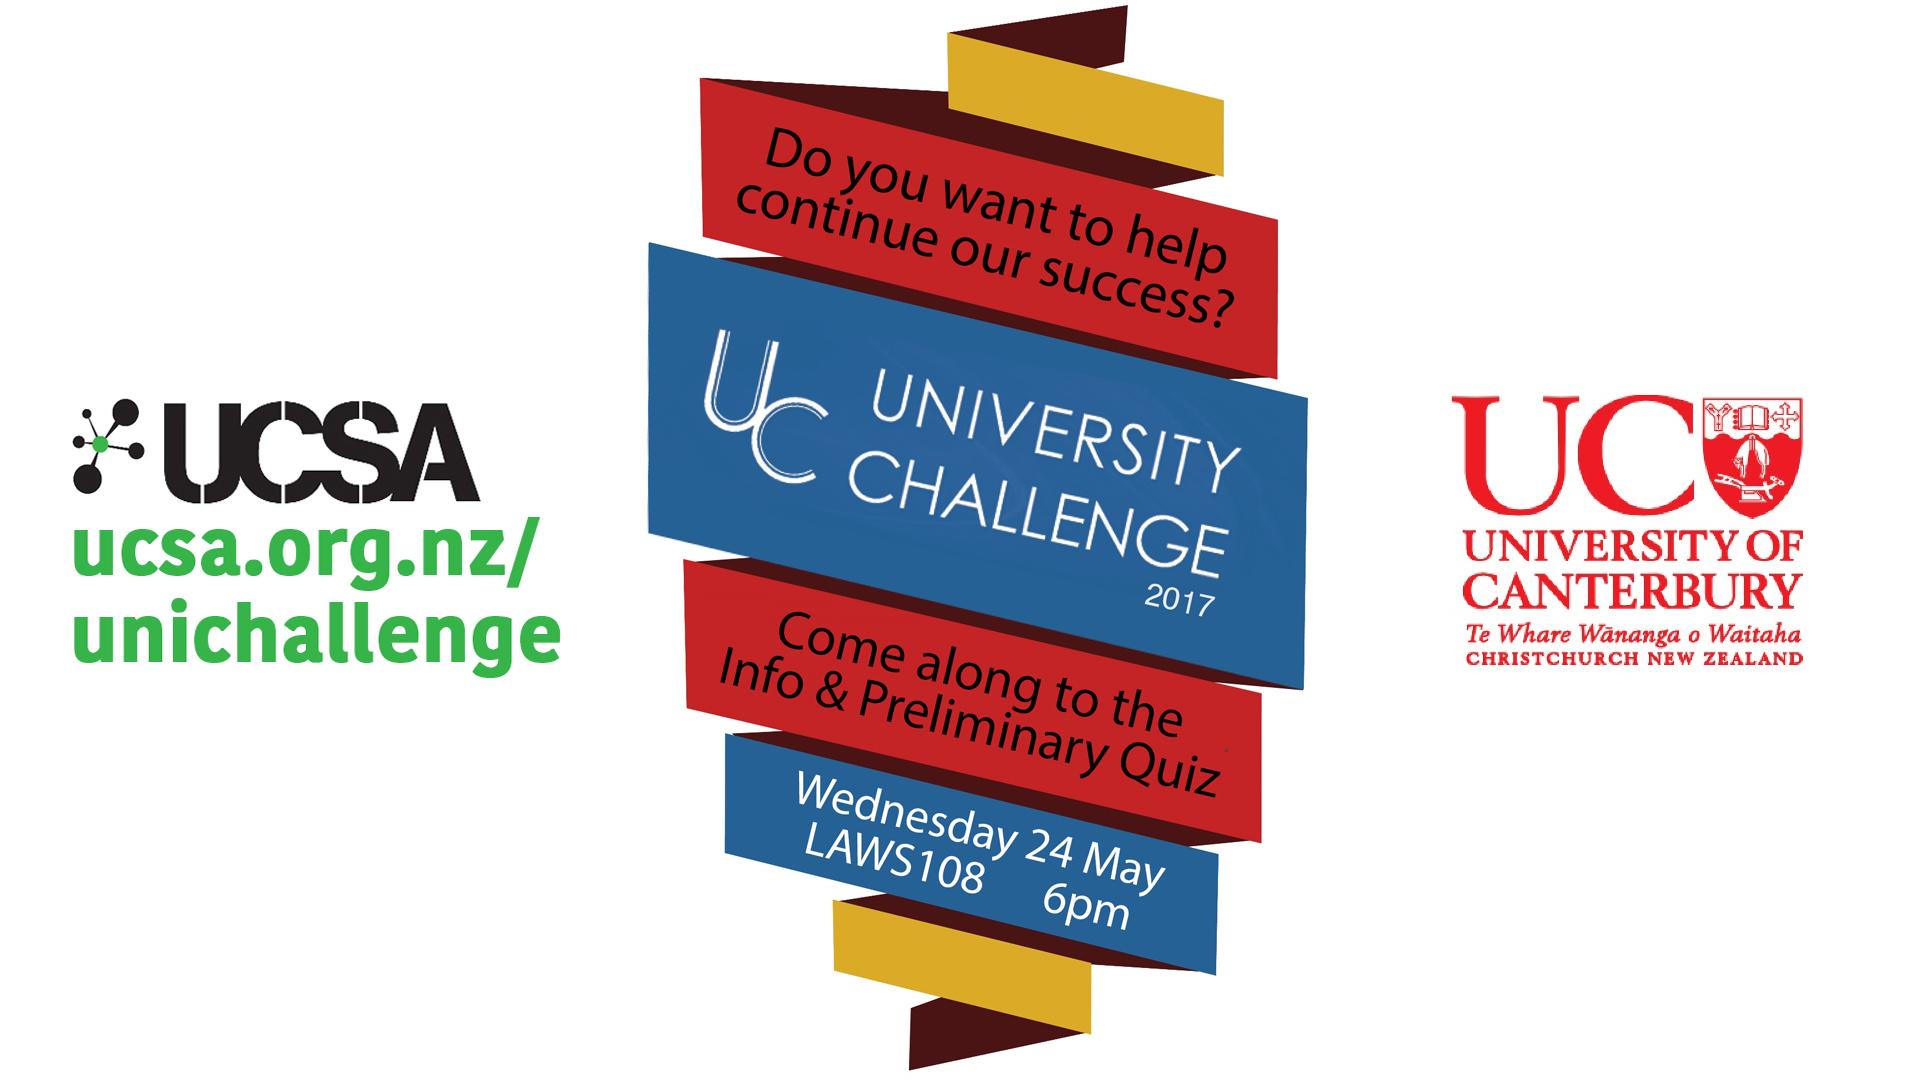 UniCChallenge_2017_UCTV-FIX